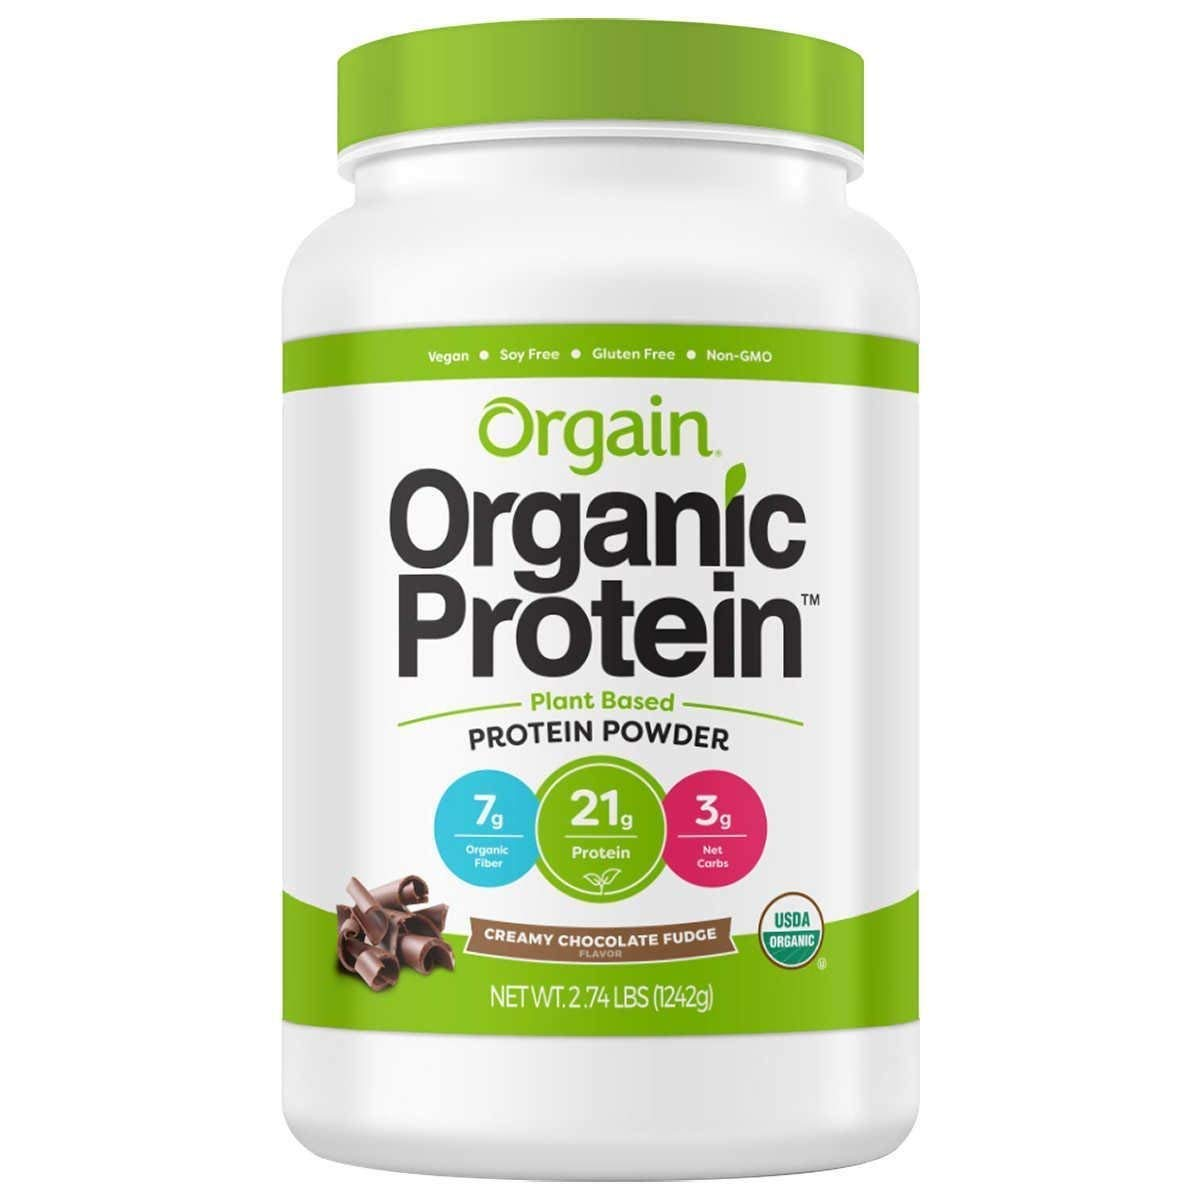 Orgain Organic Plant Based Protein Powder, Nautral Unsweetened, Vegan, Gluten Free, Kosher, Non-GMO, 1 Count, Packaging May Vary (Creamy Chocolate Fudge, 2.74 Pound)